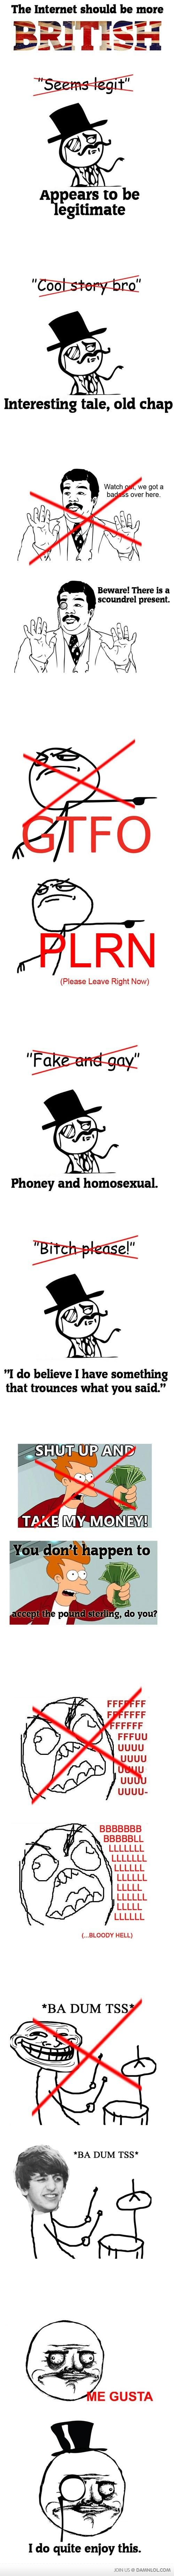 british is good. :)